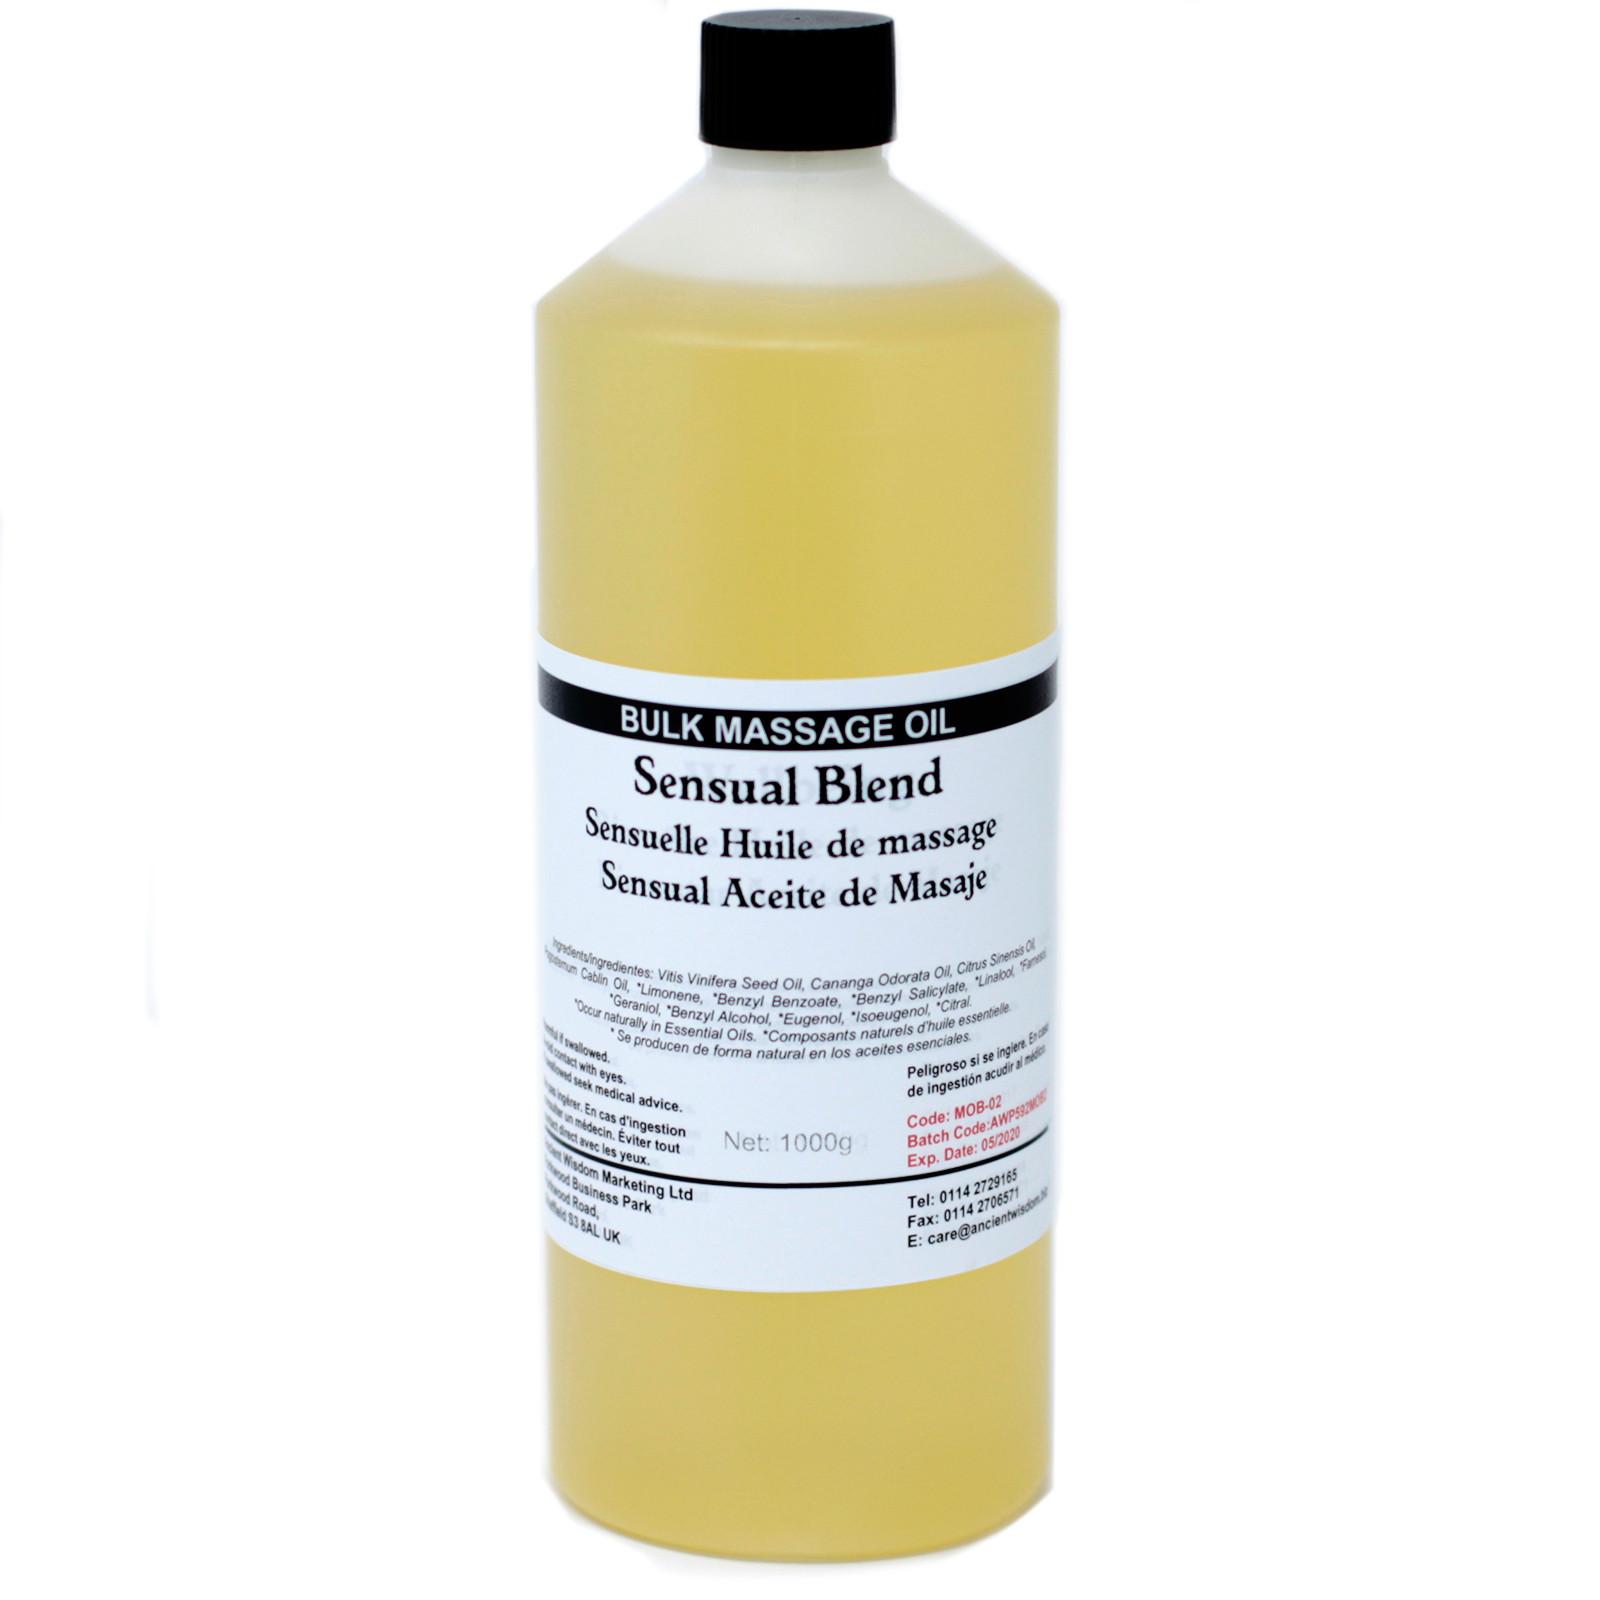 Sensual 1Kg Massage Oil